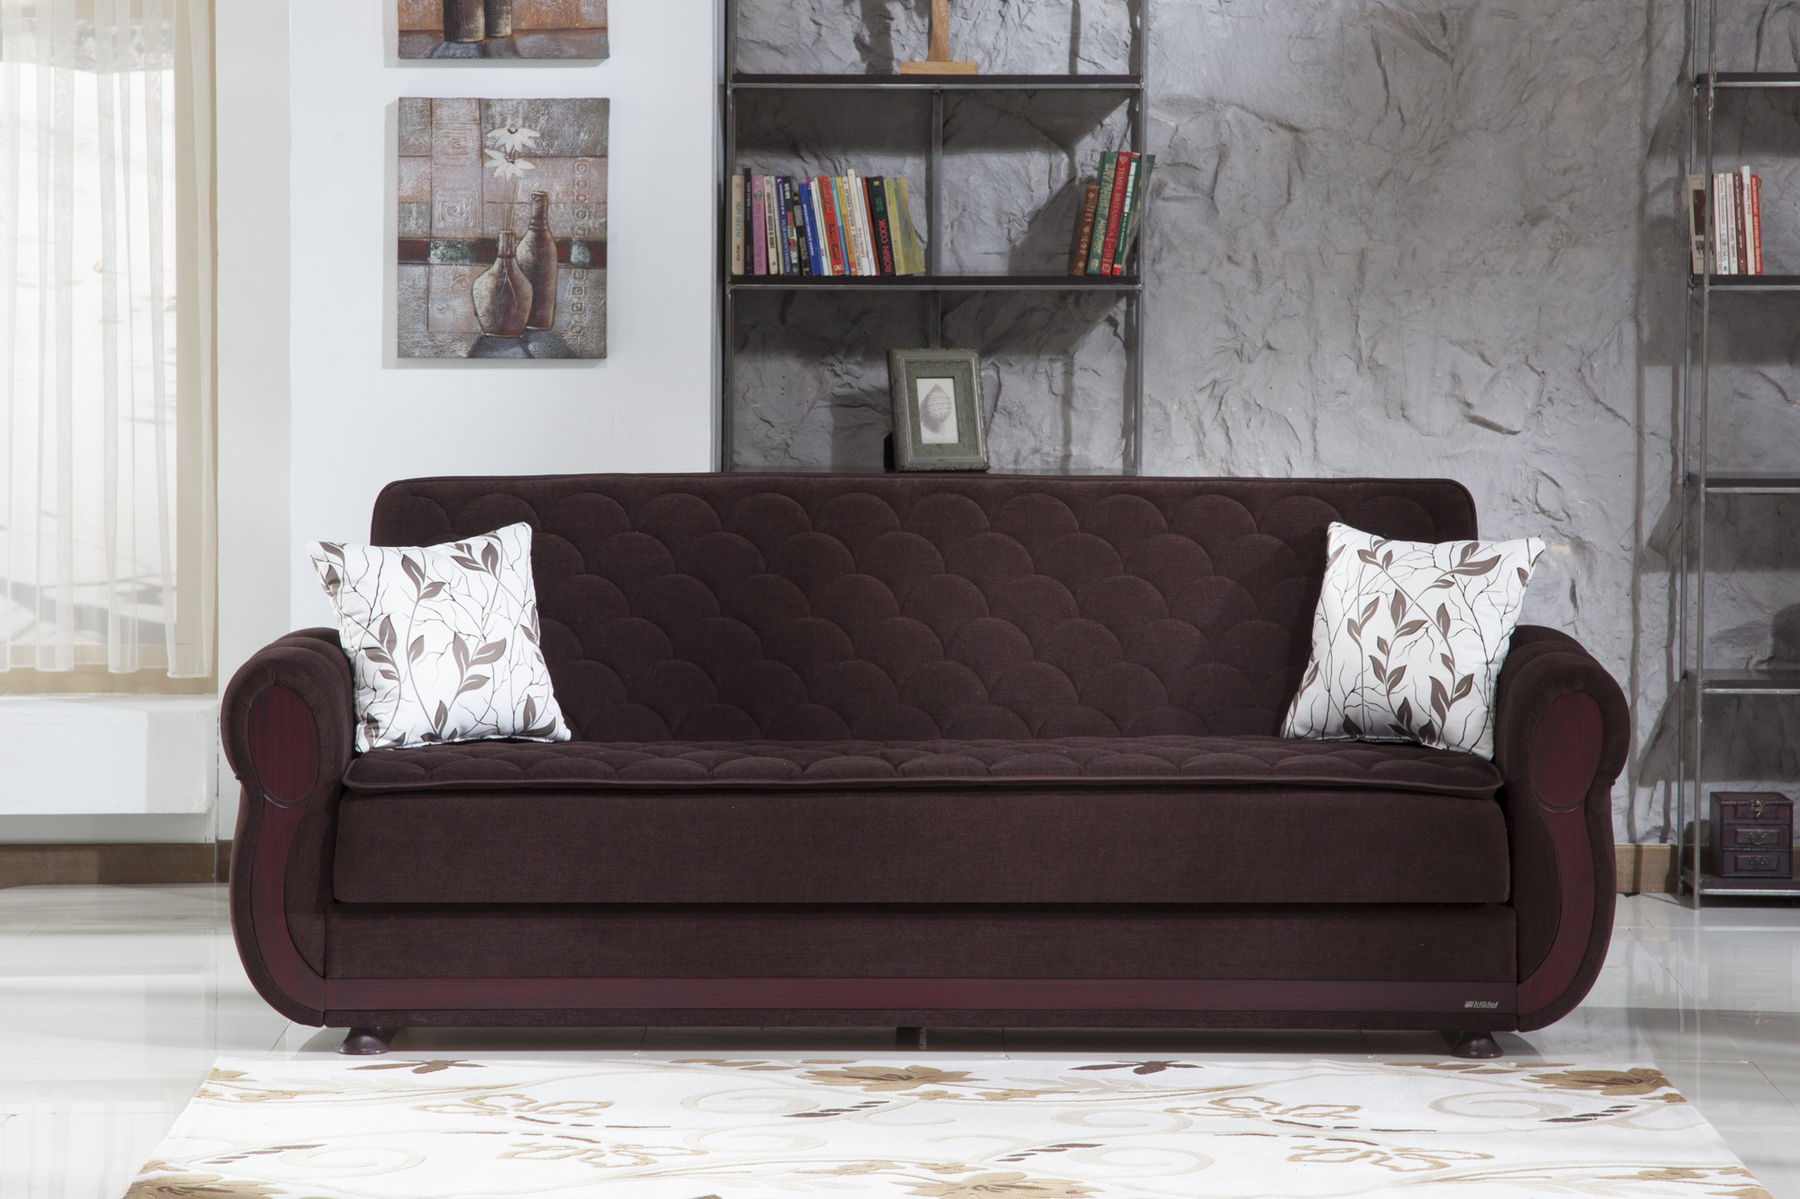 Argos Colin Brown Sofa Bed 5532d